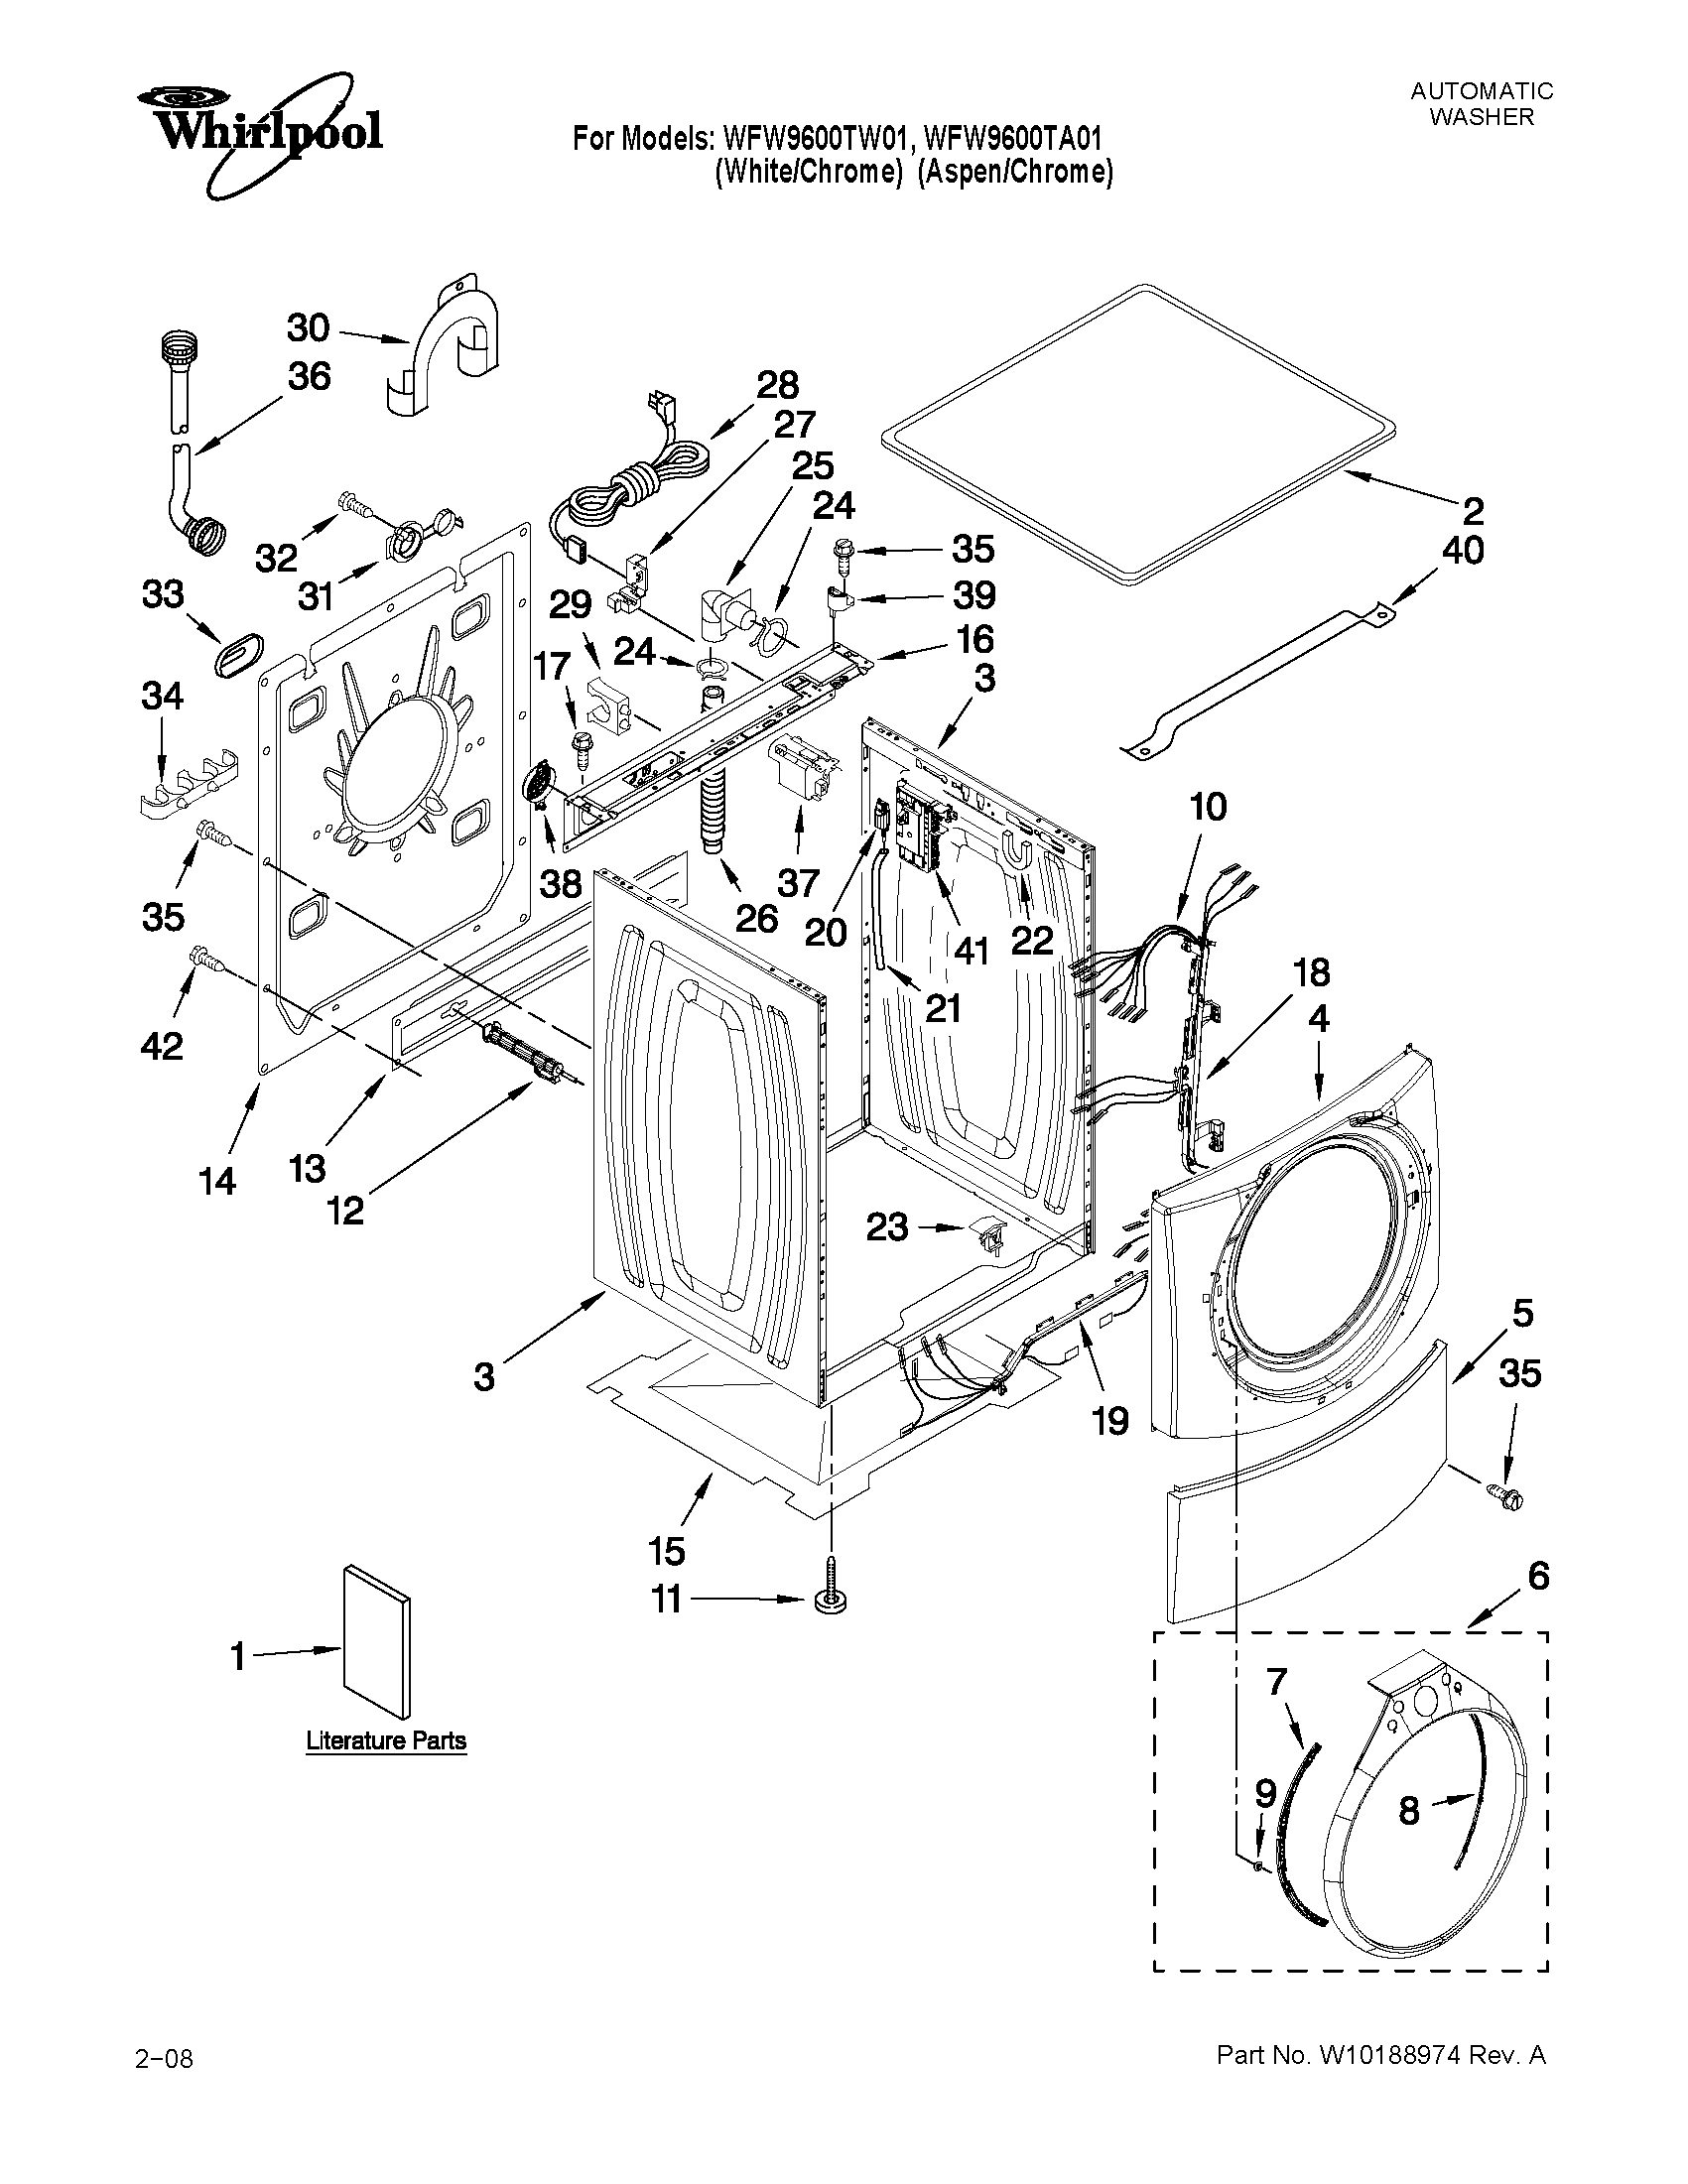 Wiring Diagram: 29 Whirlpool Duet Dryer Parts Diagram